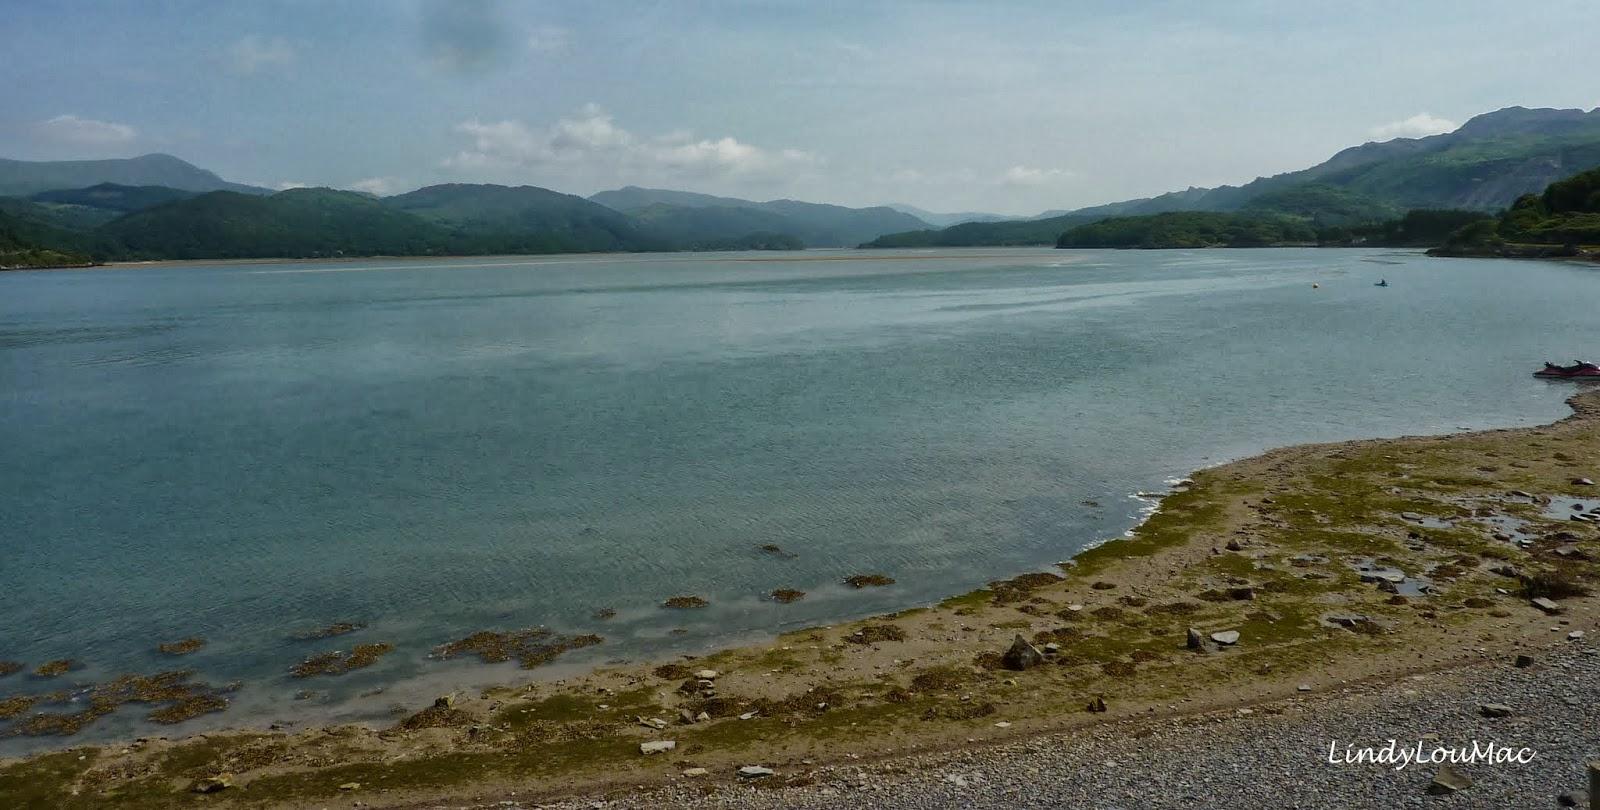 View Across The Estuary From Toll Bridge